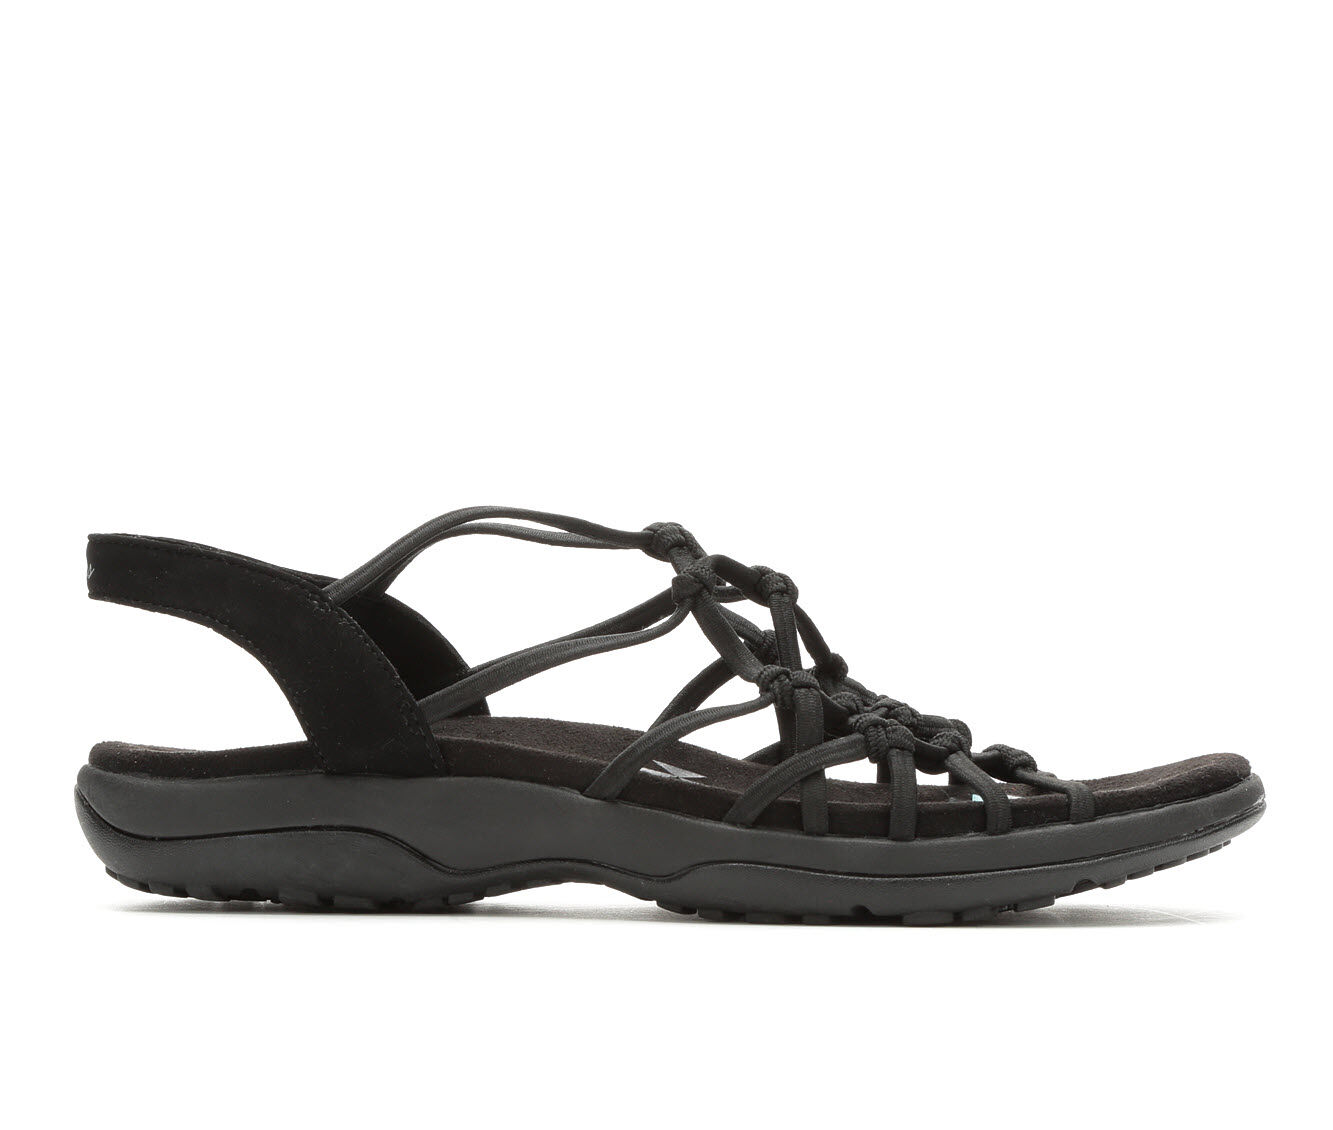 choose authentic new Women's Skechers Reggae Slim Forget Me Knot Hiking Sandals Black